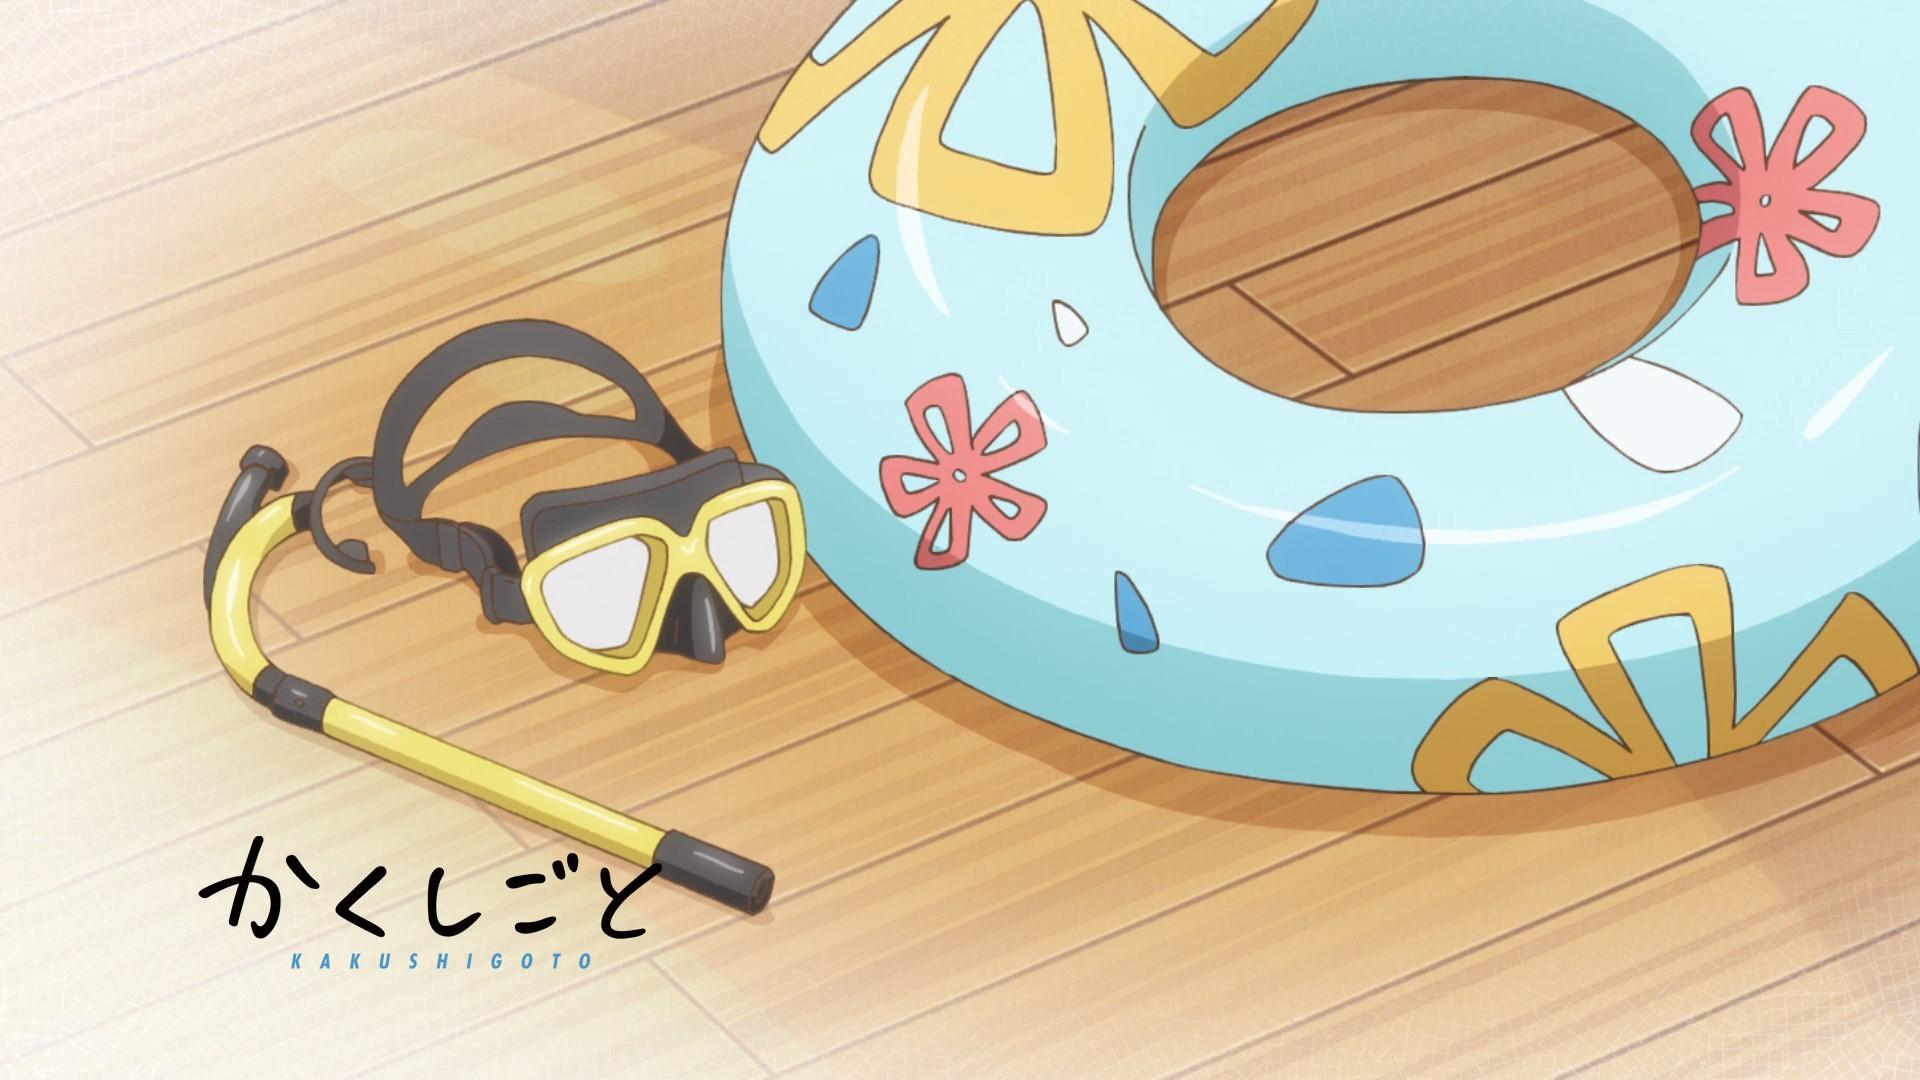 Kakushigoto Episode 02 Eyecatch 1